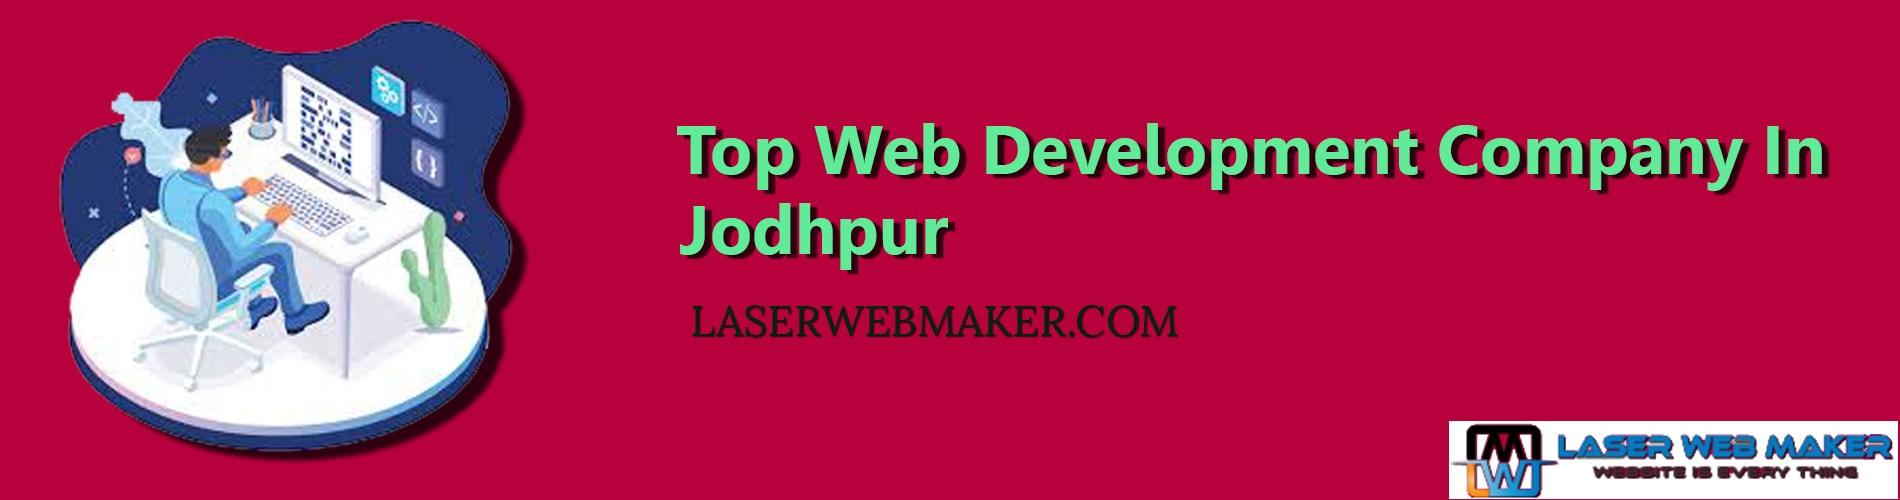 Top Web Development Company In Jodhpur, Rajasthan